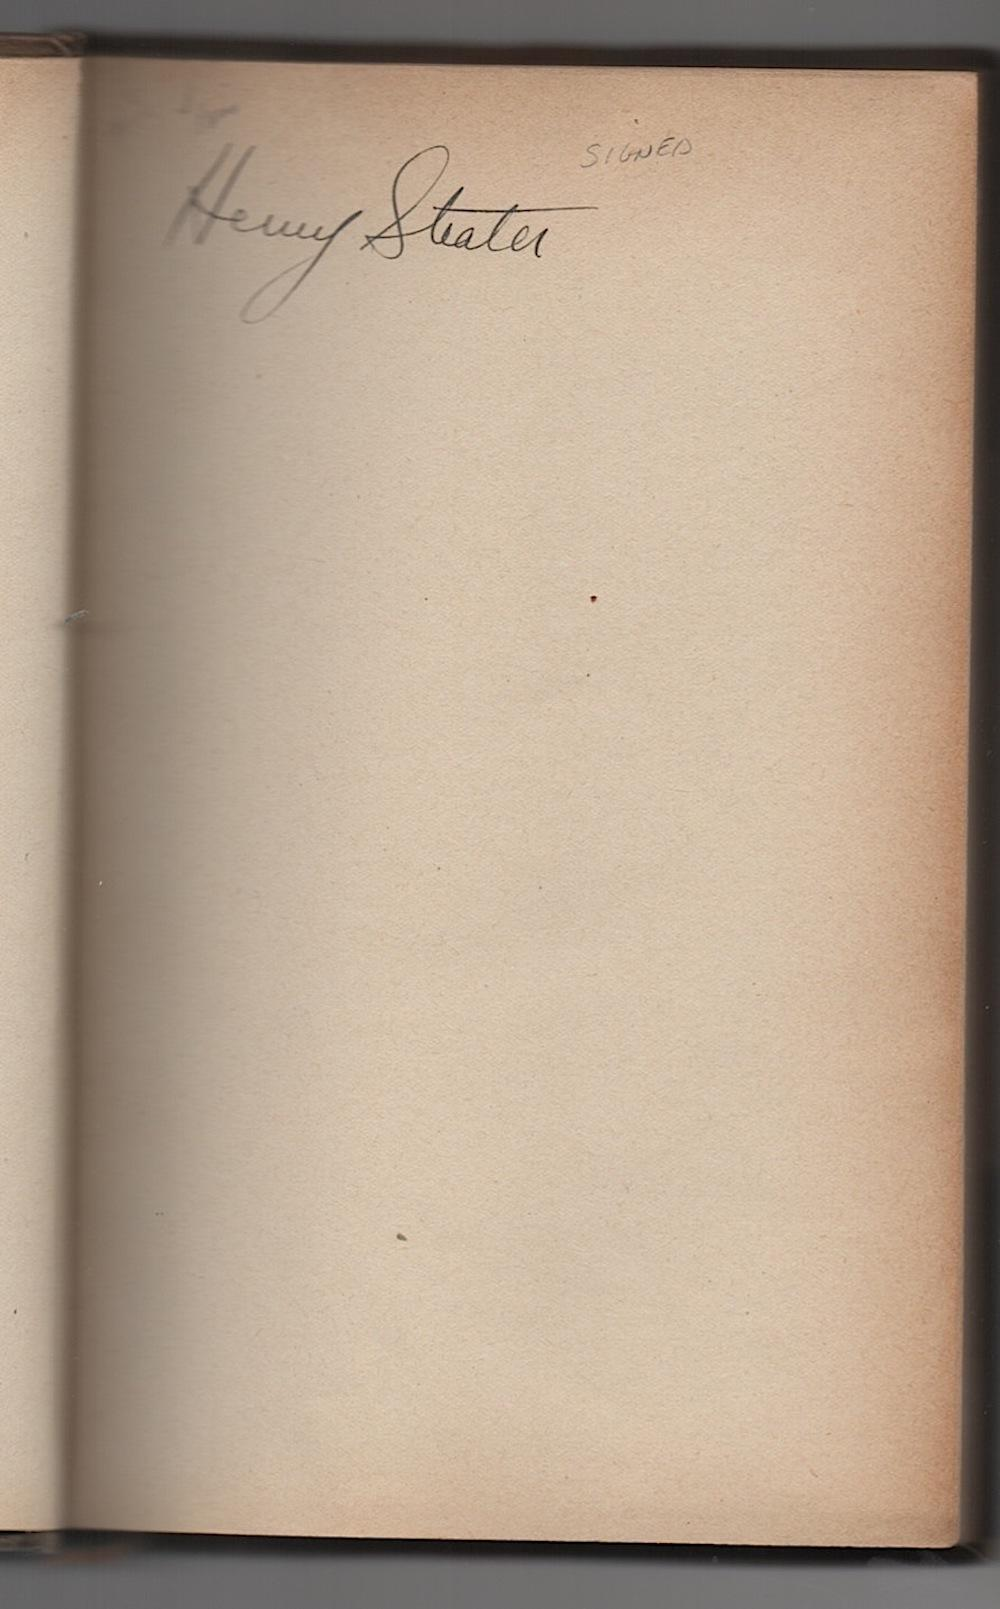 1924 LES ENTRETIENS DE NANG TANTRAIL signed by Henry Strater